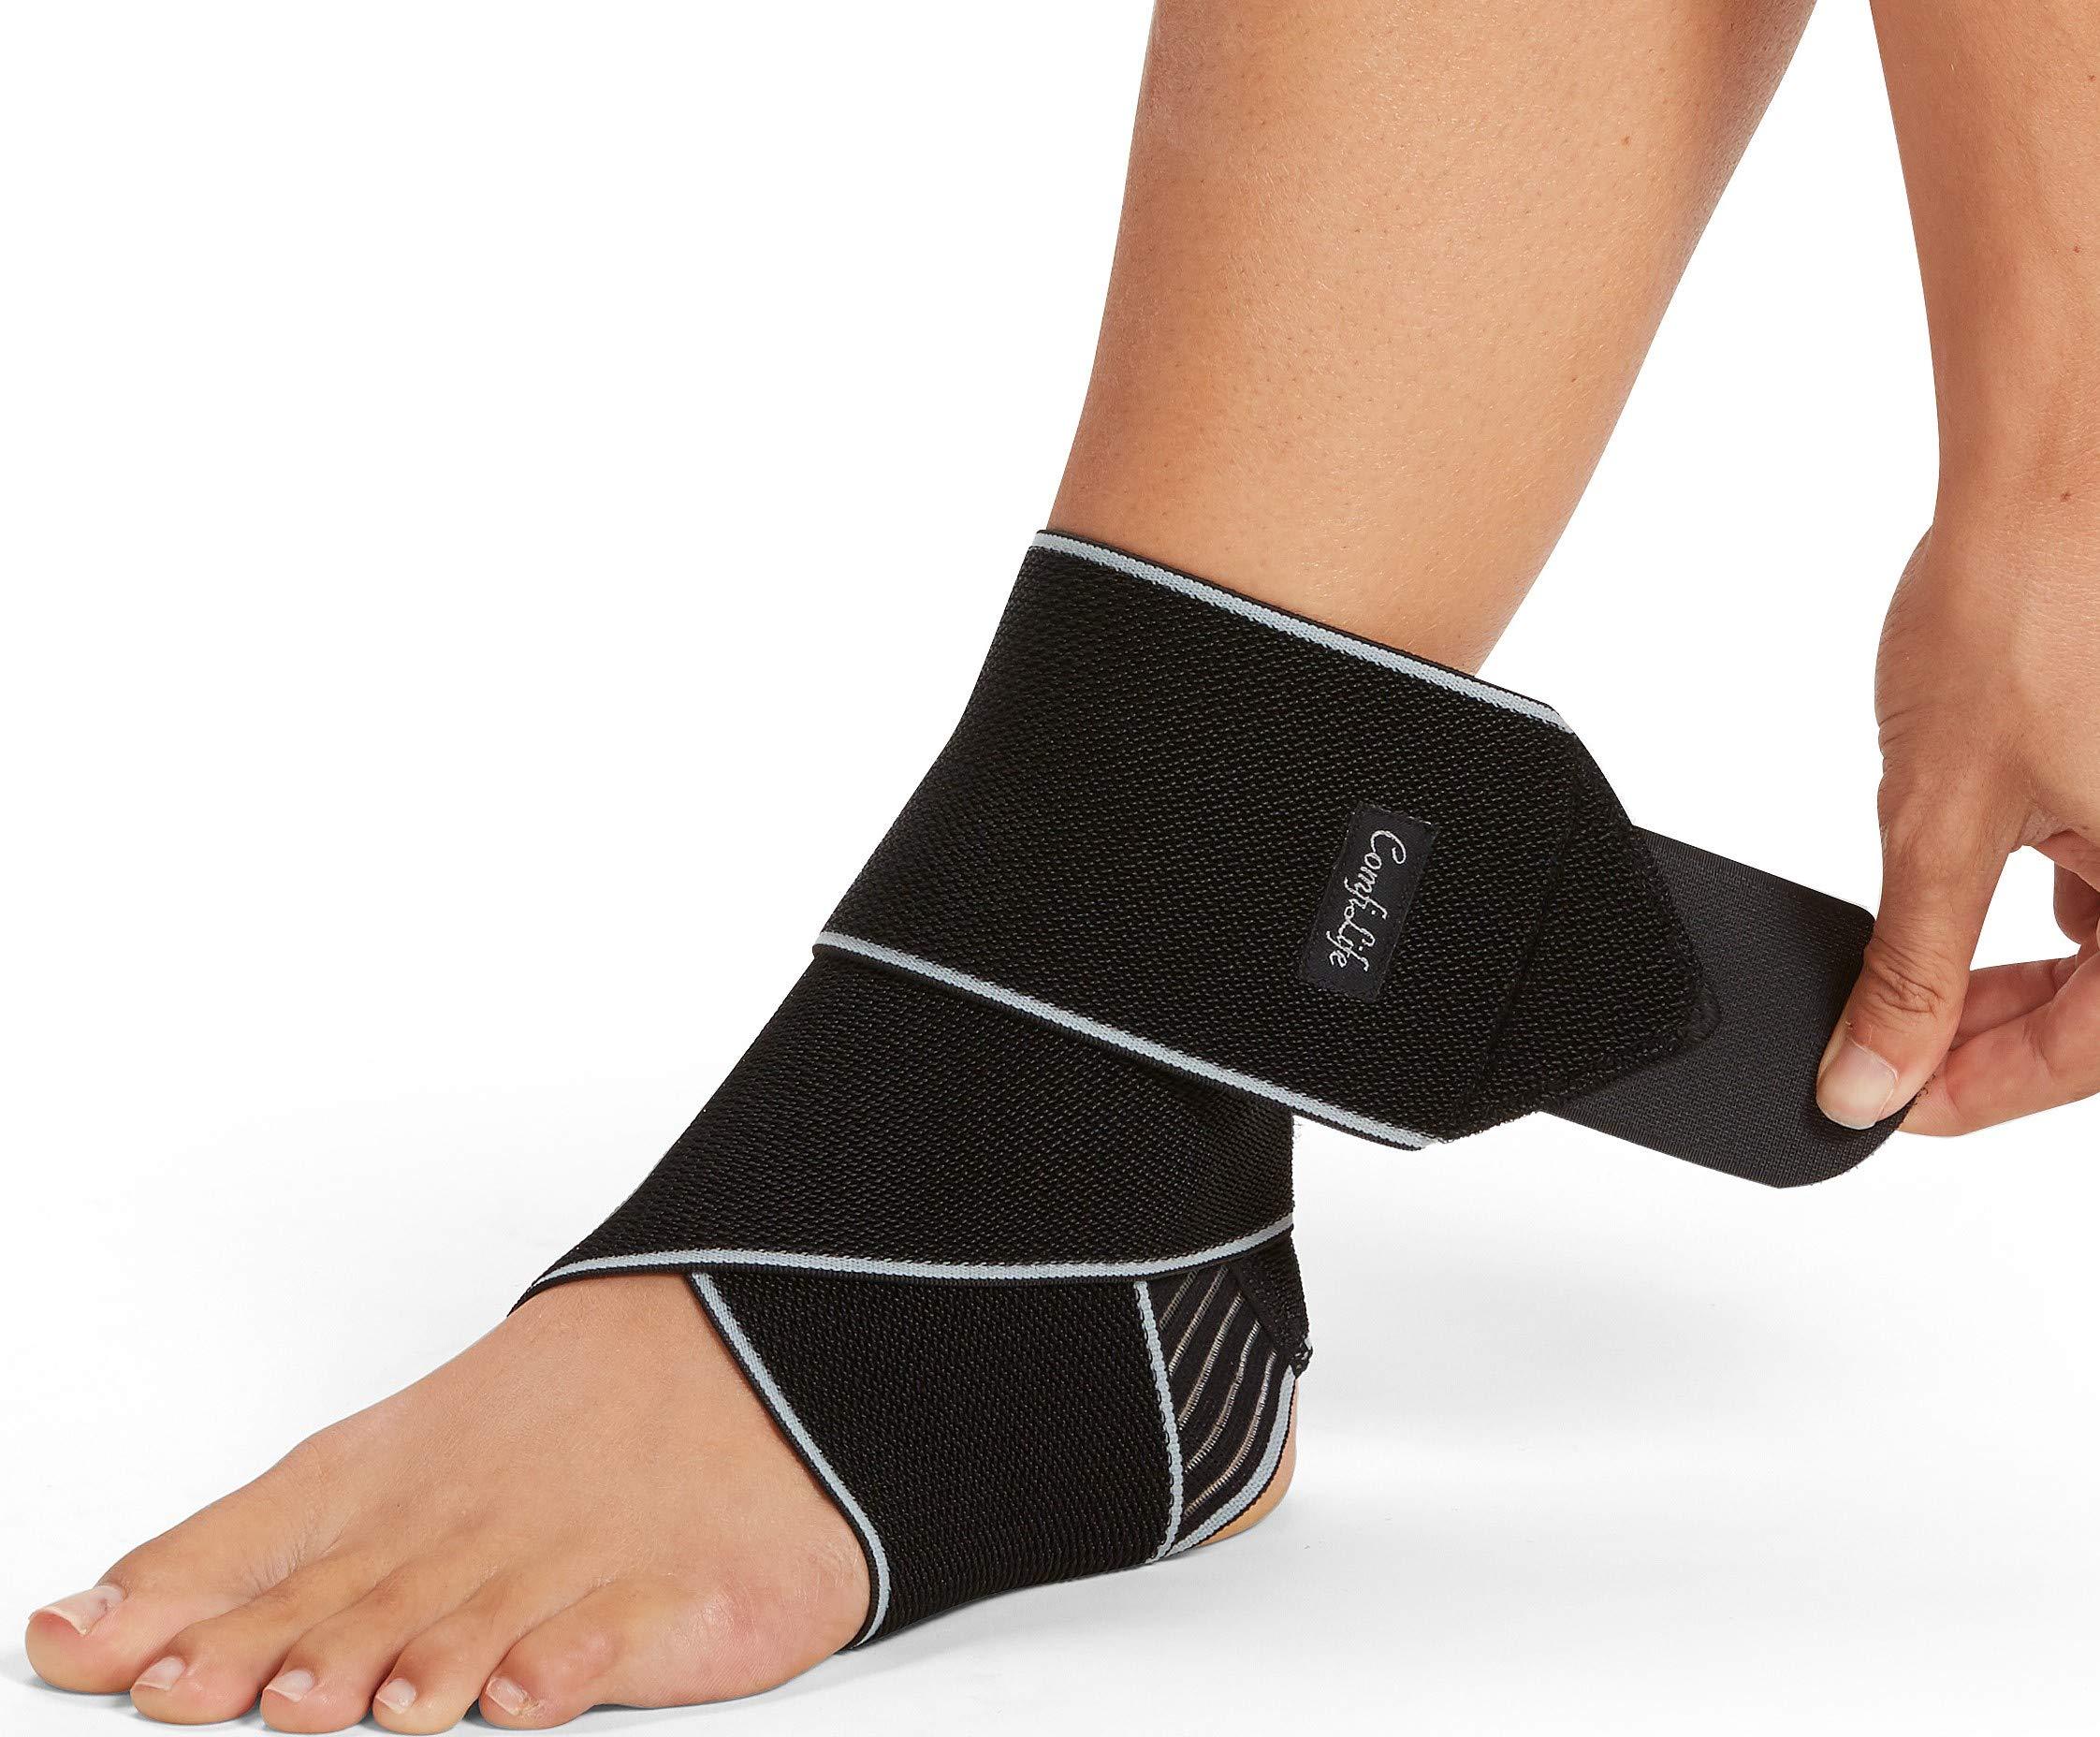 ComfiLife Premium Adjustable Breathable Elastic